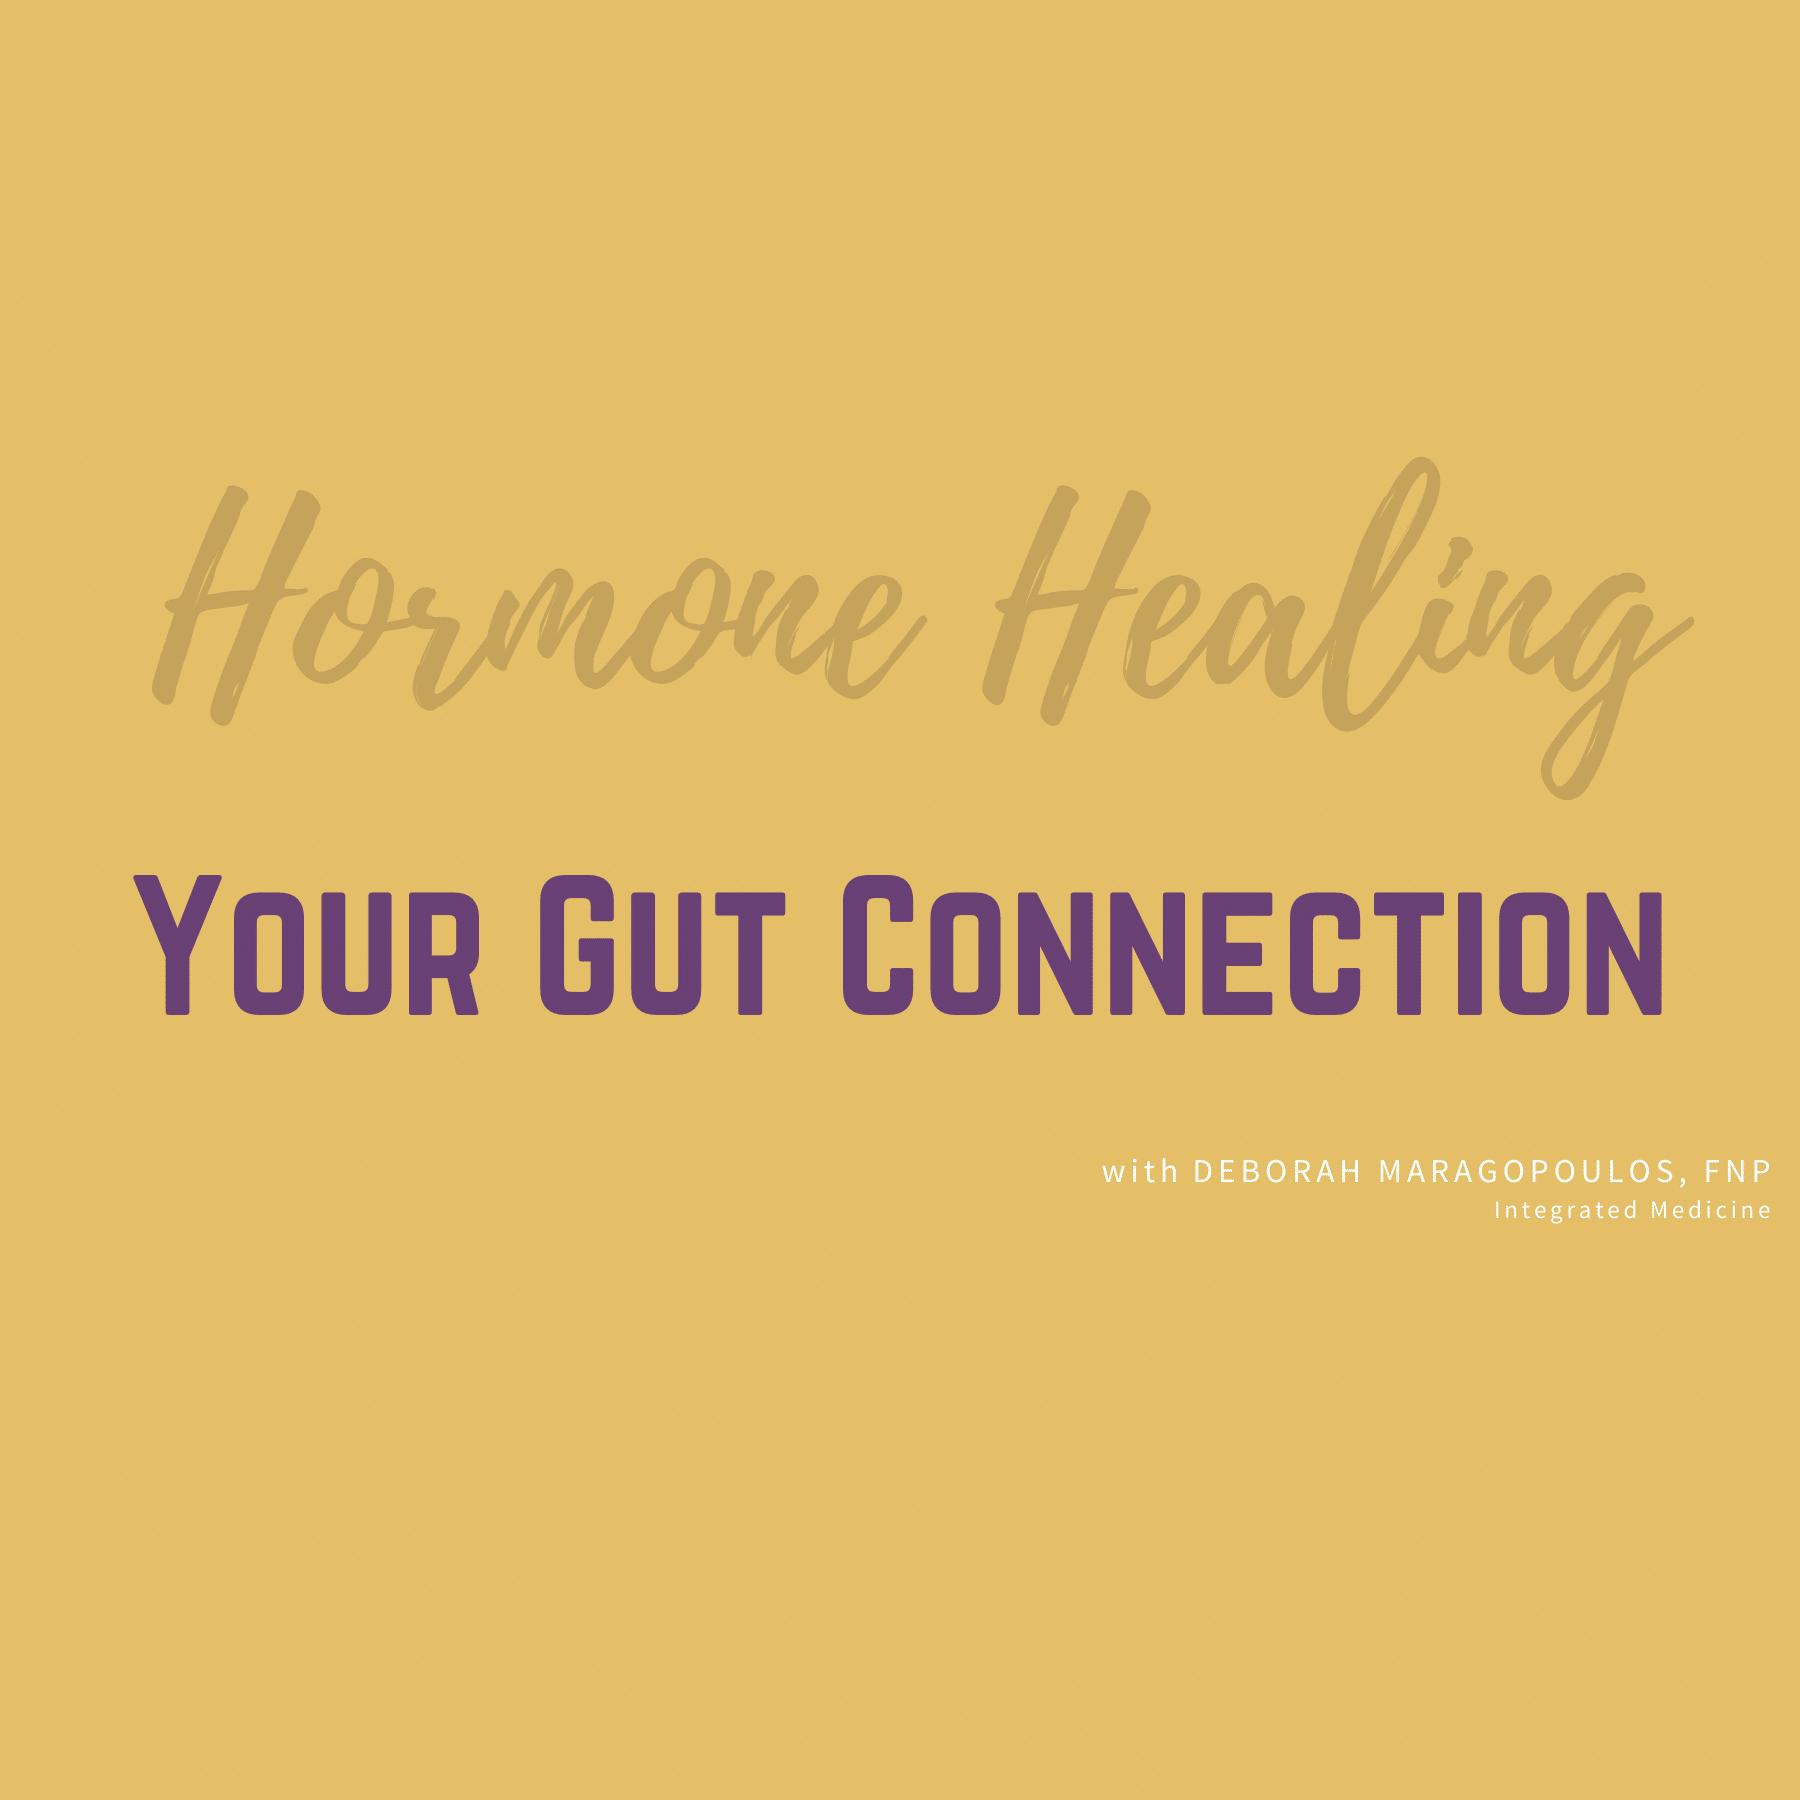 gut-connection